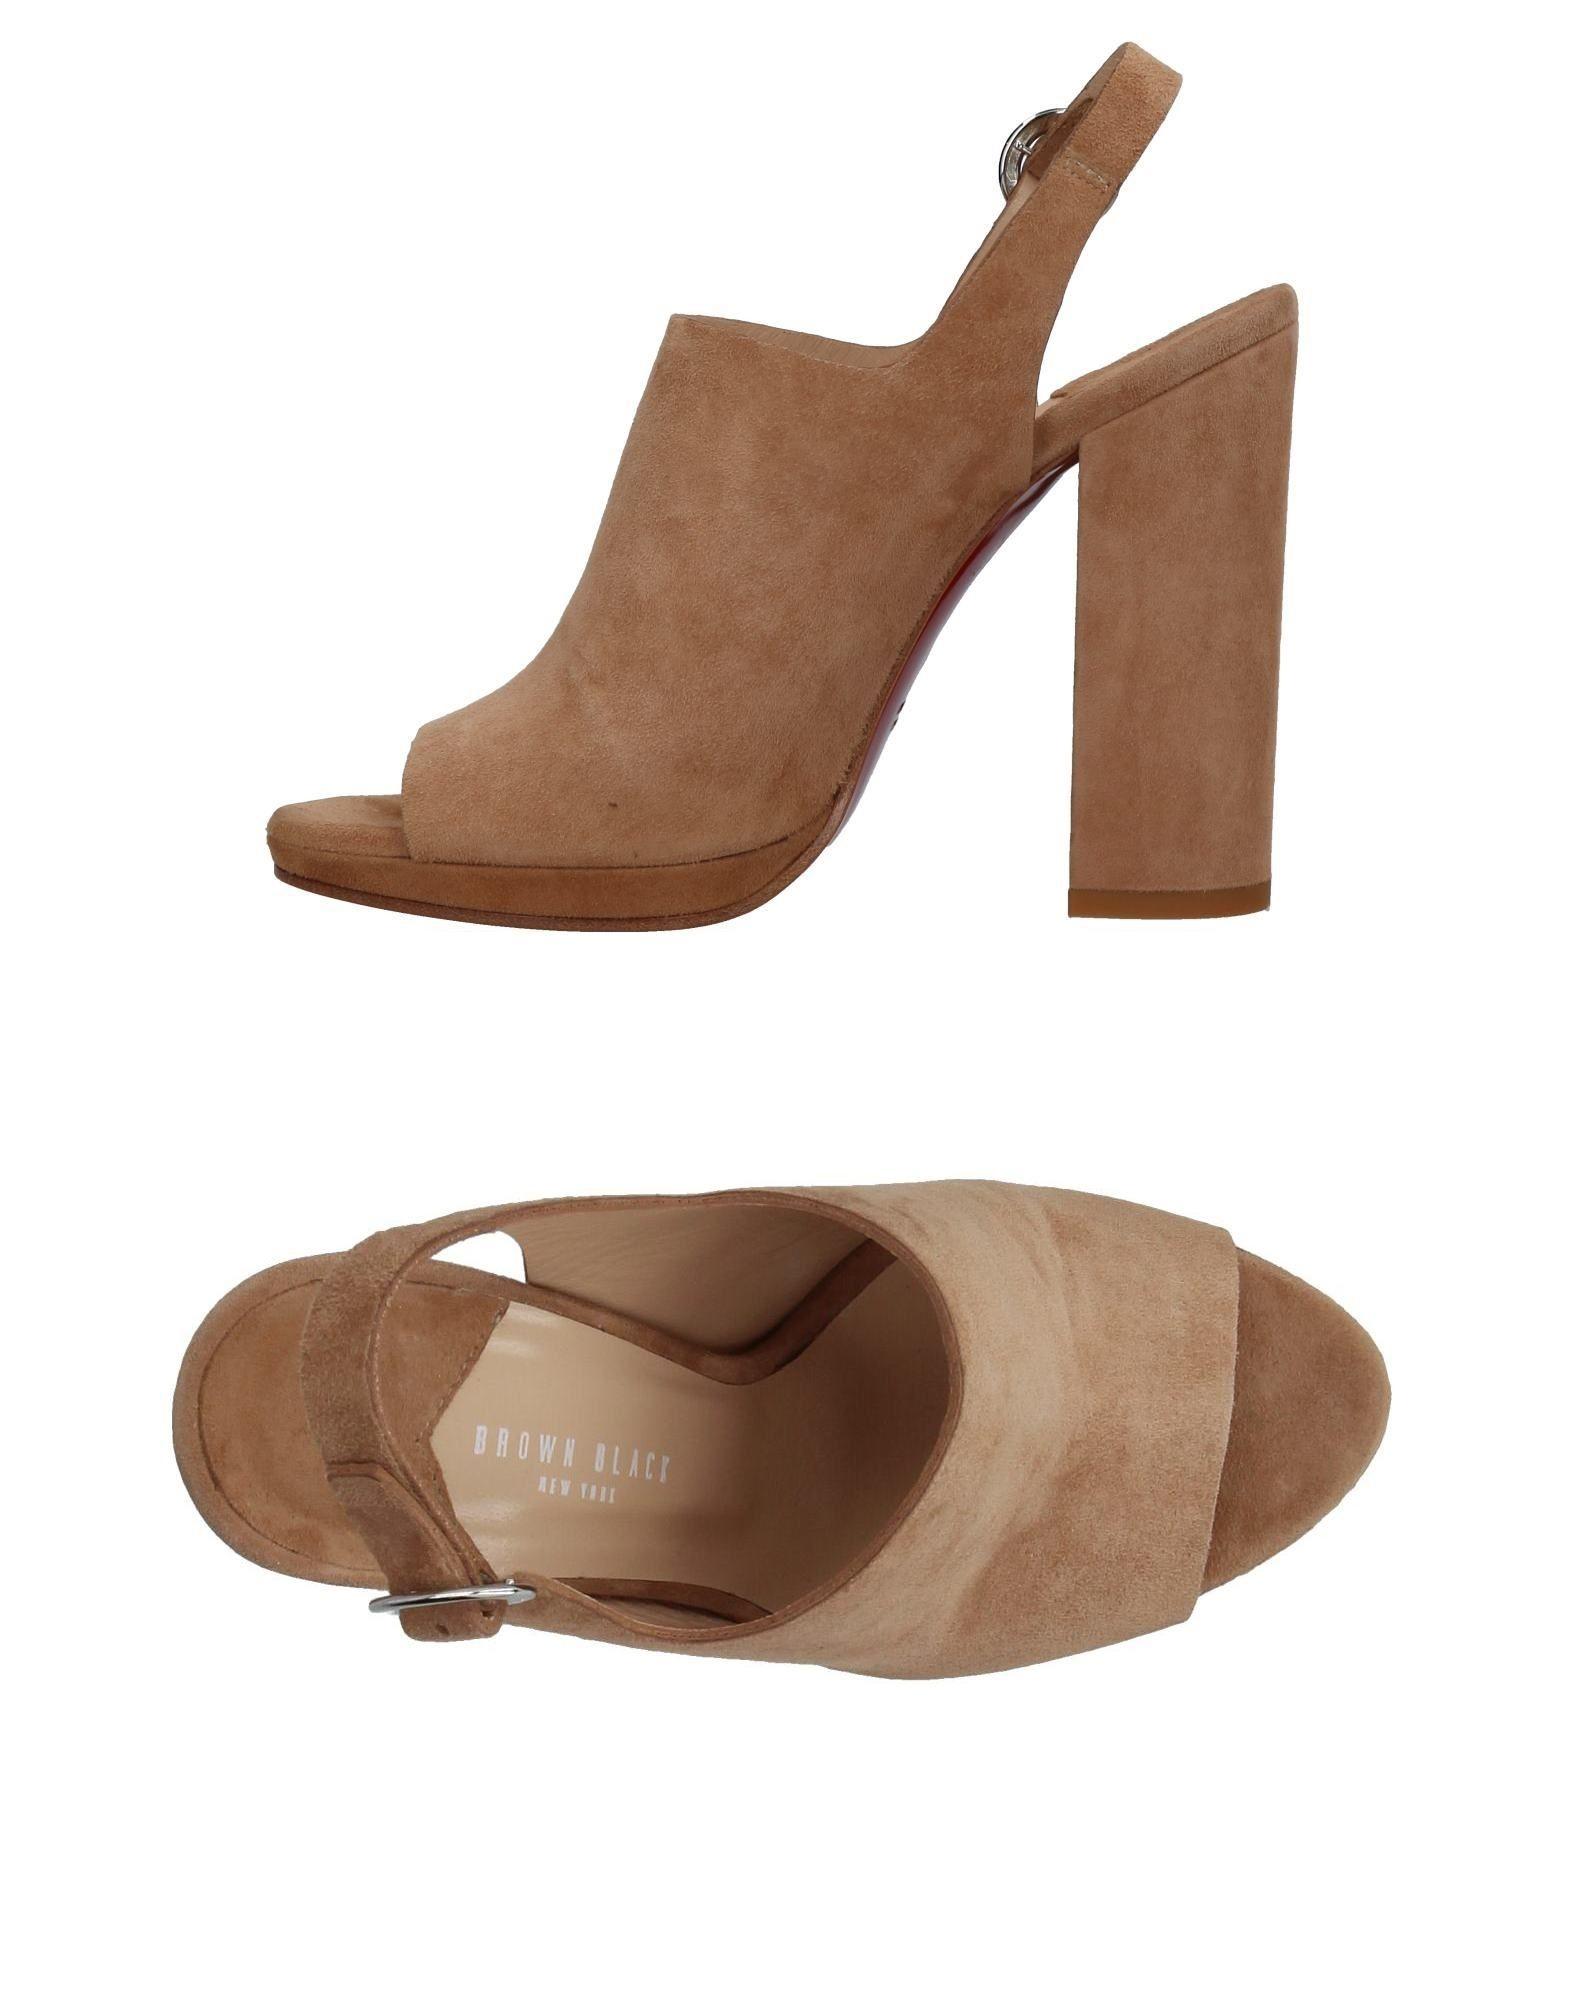 Brown Black Sandalen Damen  11376884LT Gute Qualität beliebte Schuhe